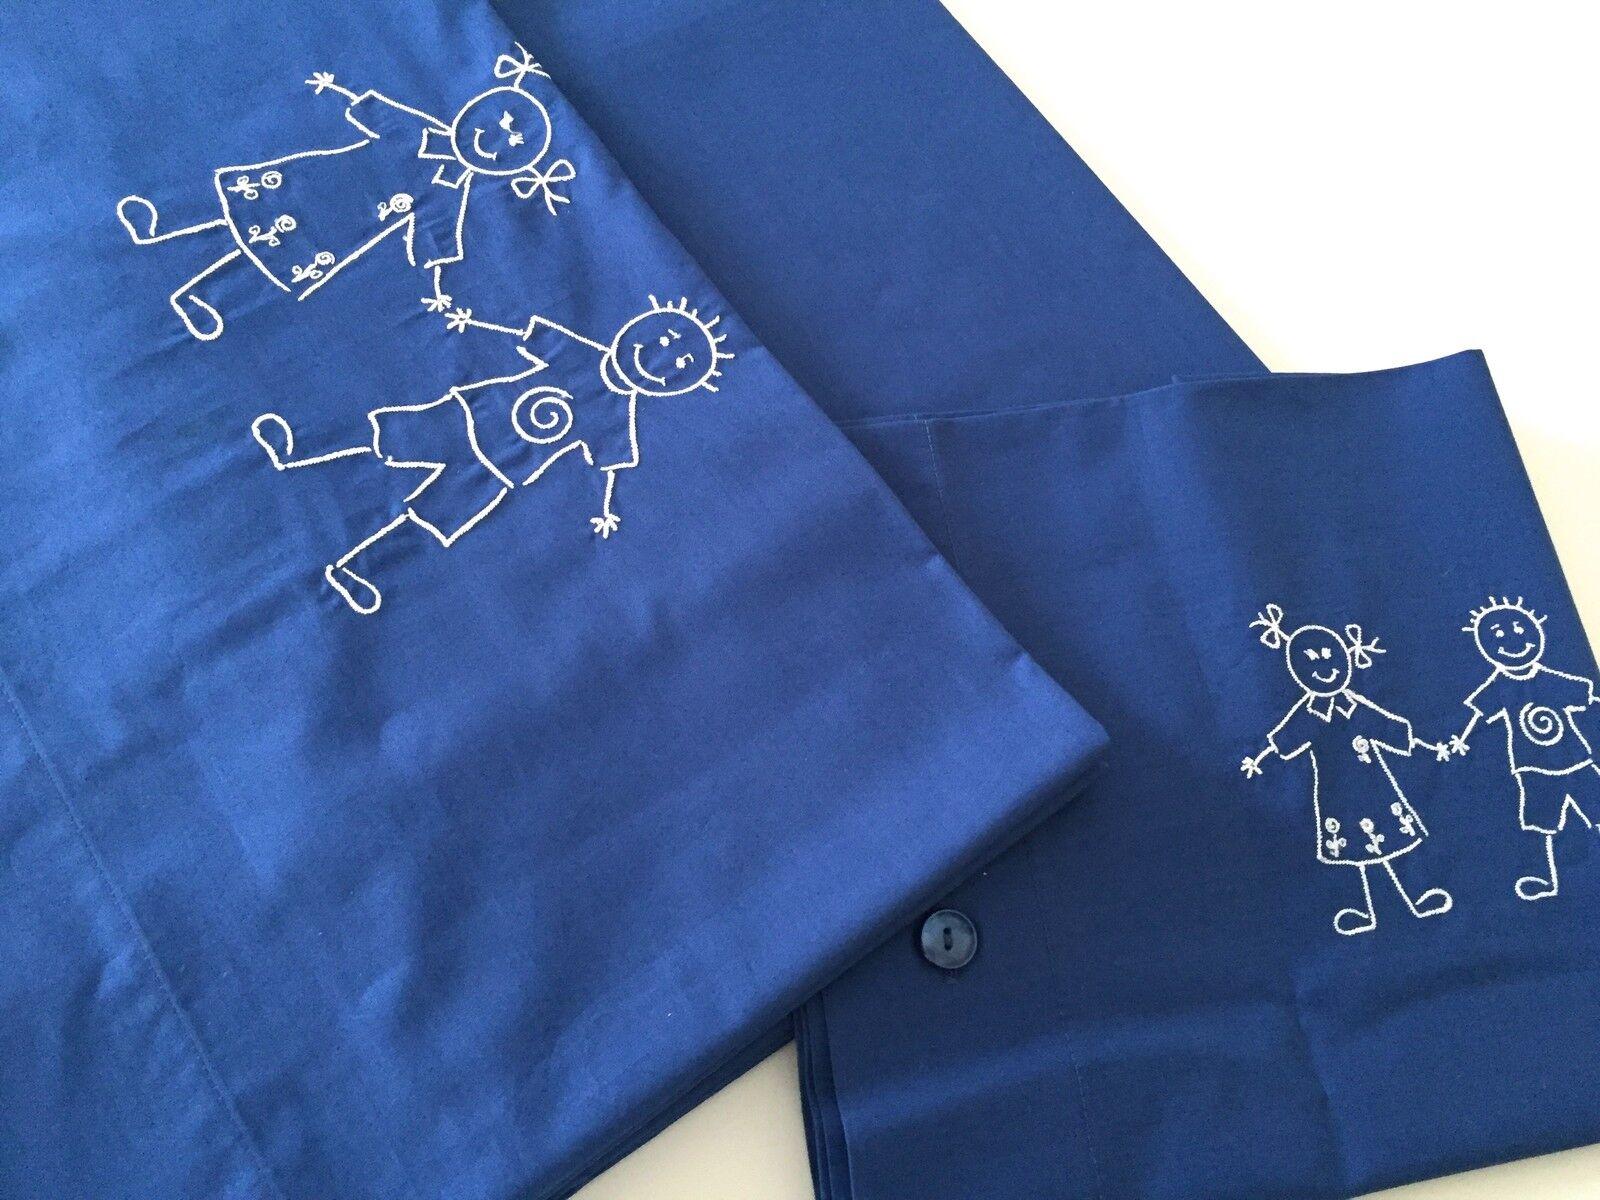 Beautiful Enfants Bed Set Linen Wiith Happy Embroidery 100%Cotton bleu 160X270cm